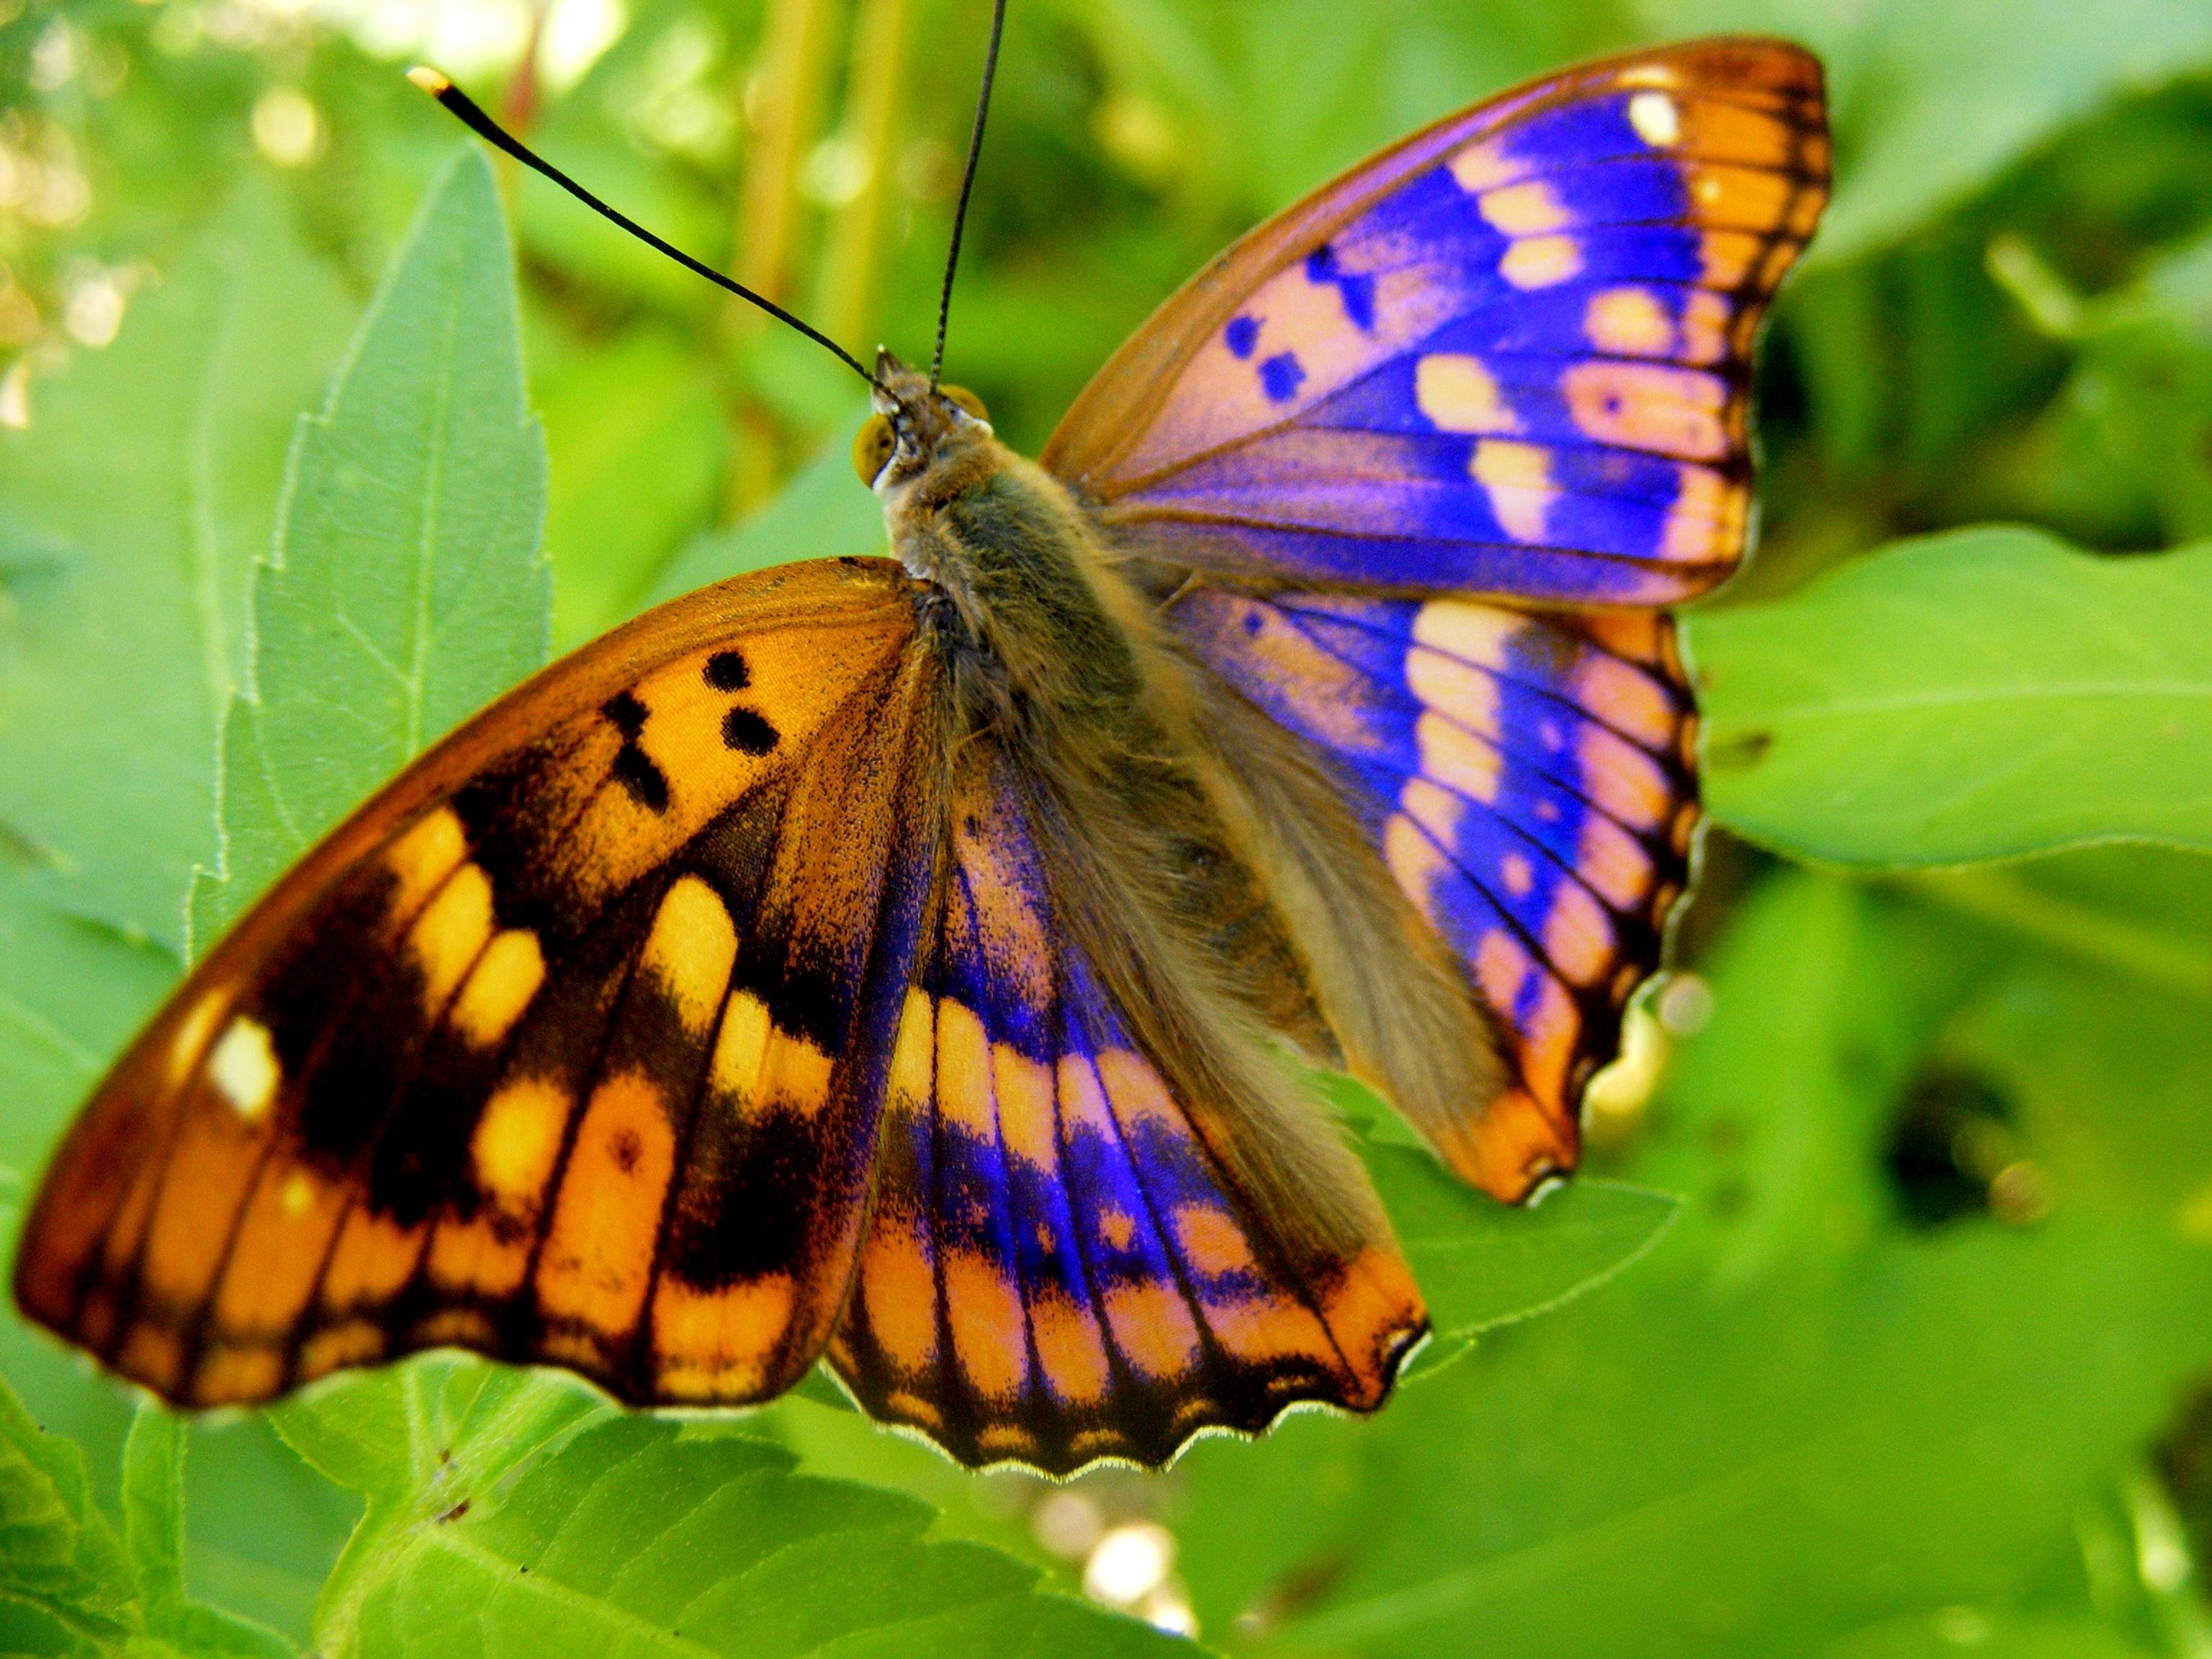 Kostenlose foto : Natur, Gras, Flügel, Blatt, Blume, Grün, Insekt ...